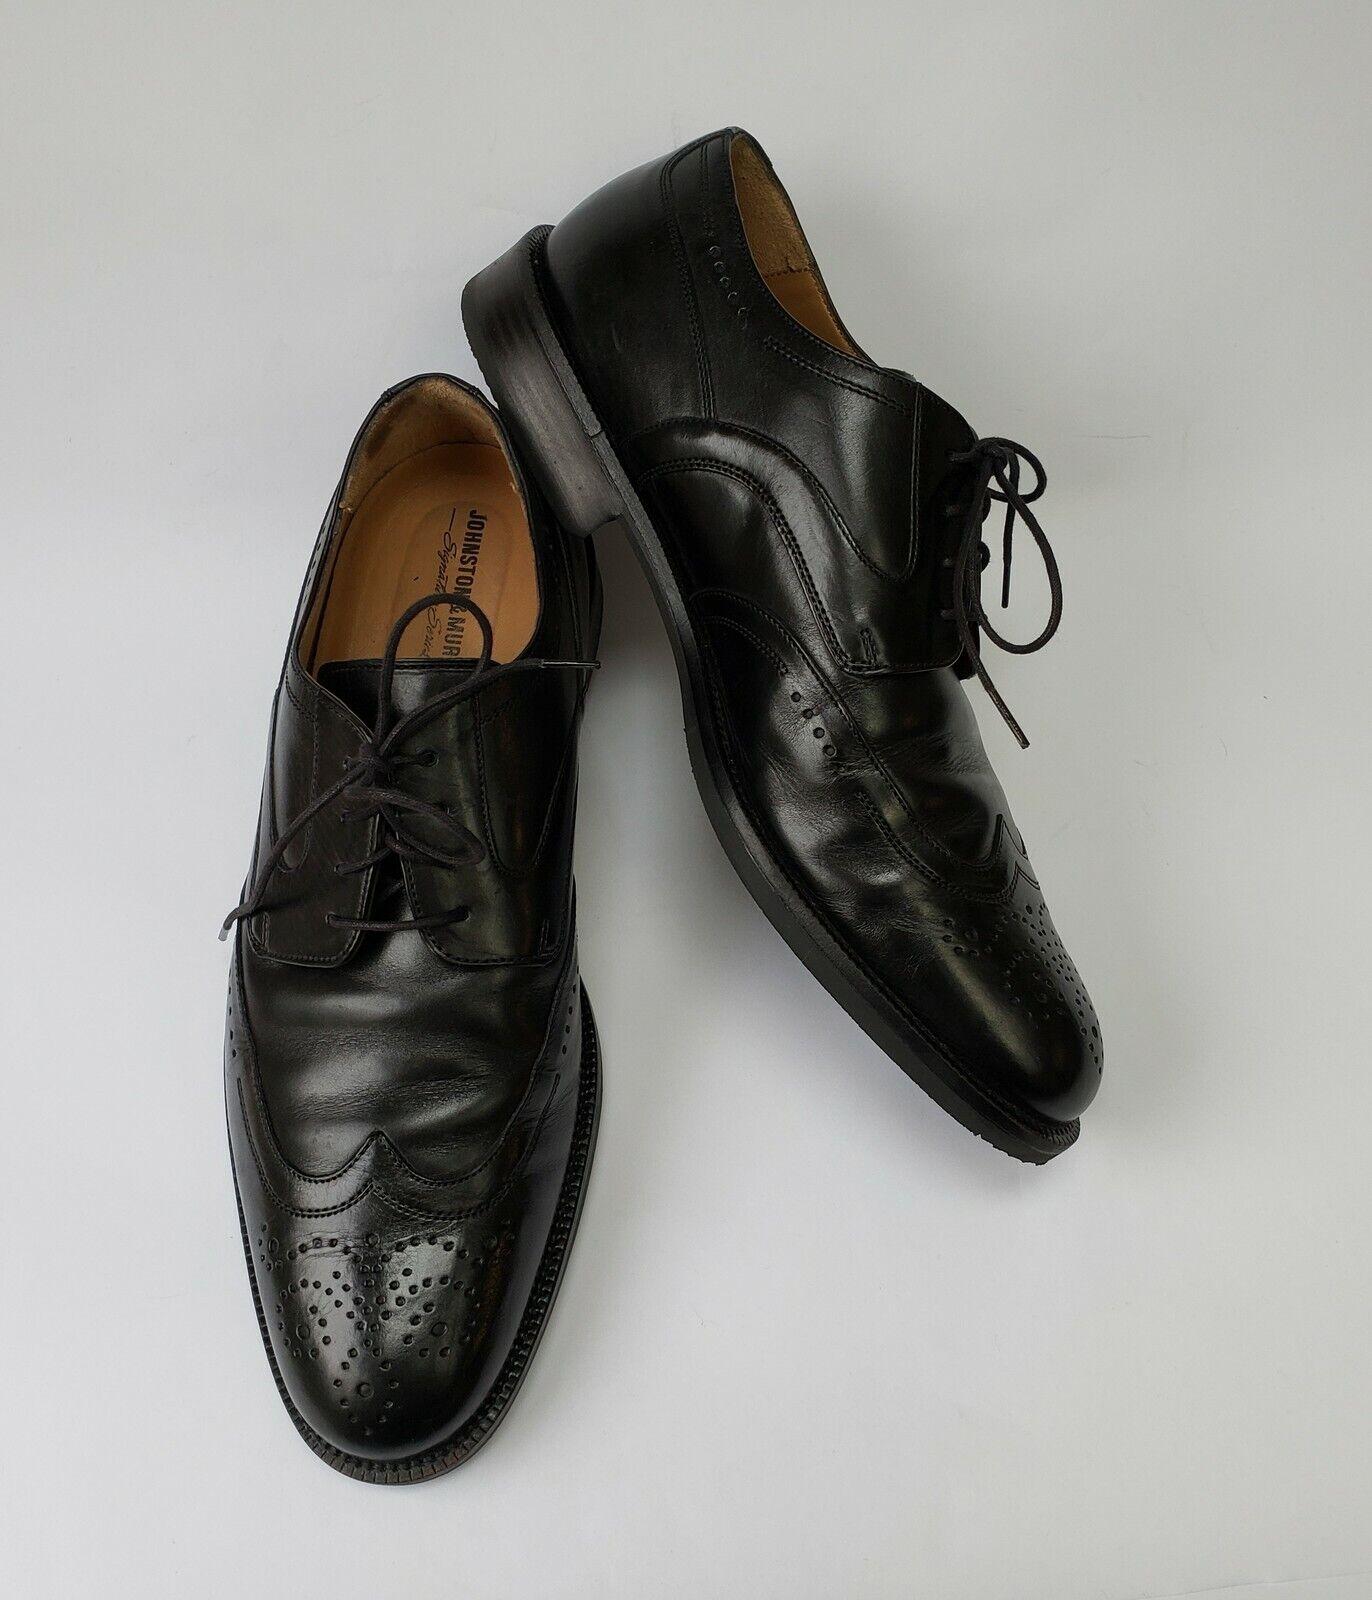 Johnston Murphy Mens Shoes Black Wingtips Oxford Signature Size US 9.5 M